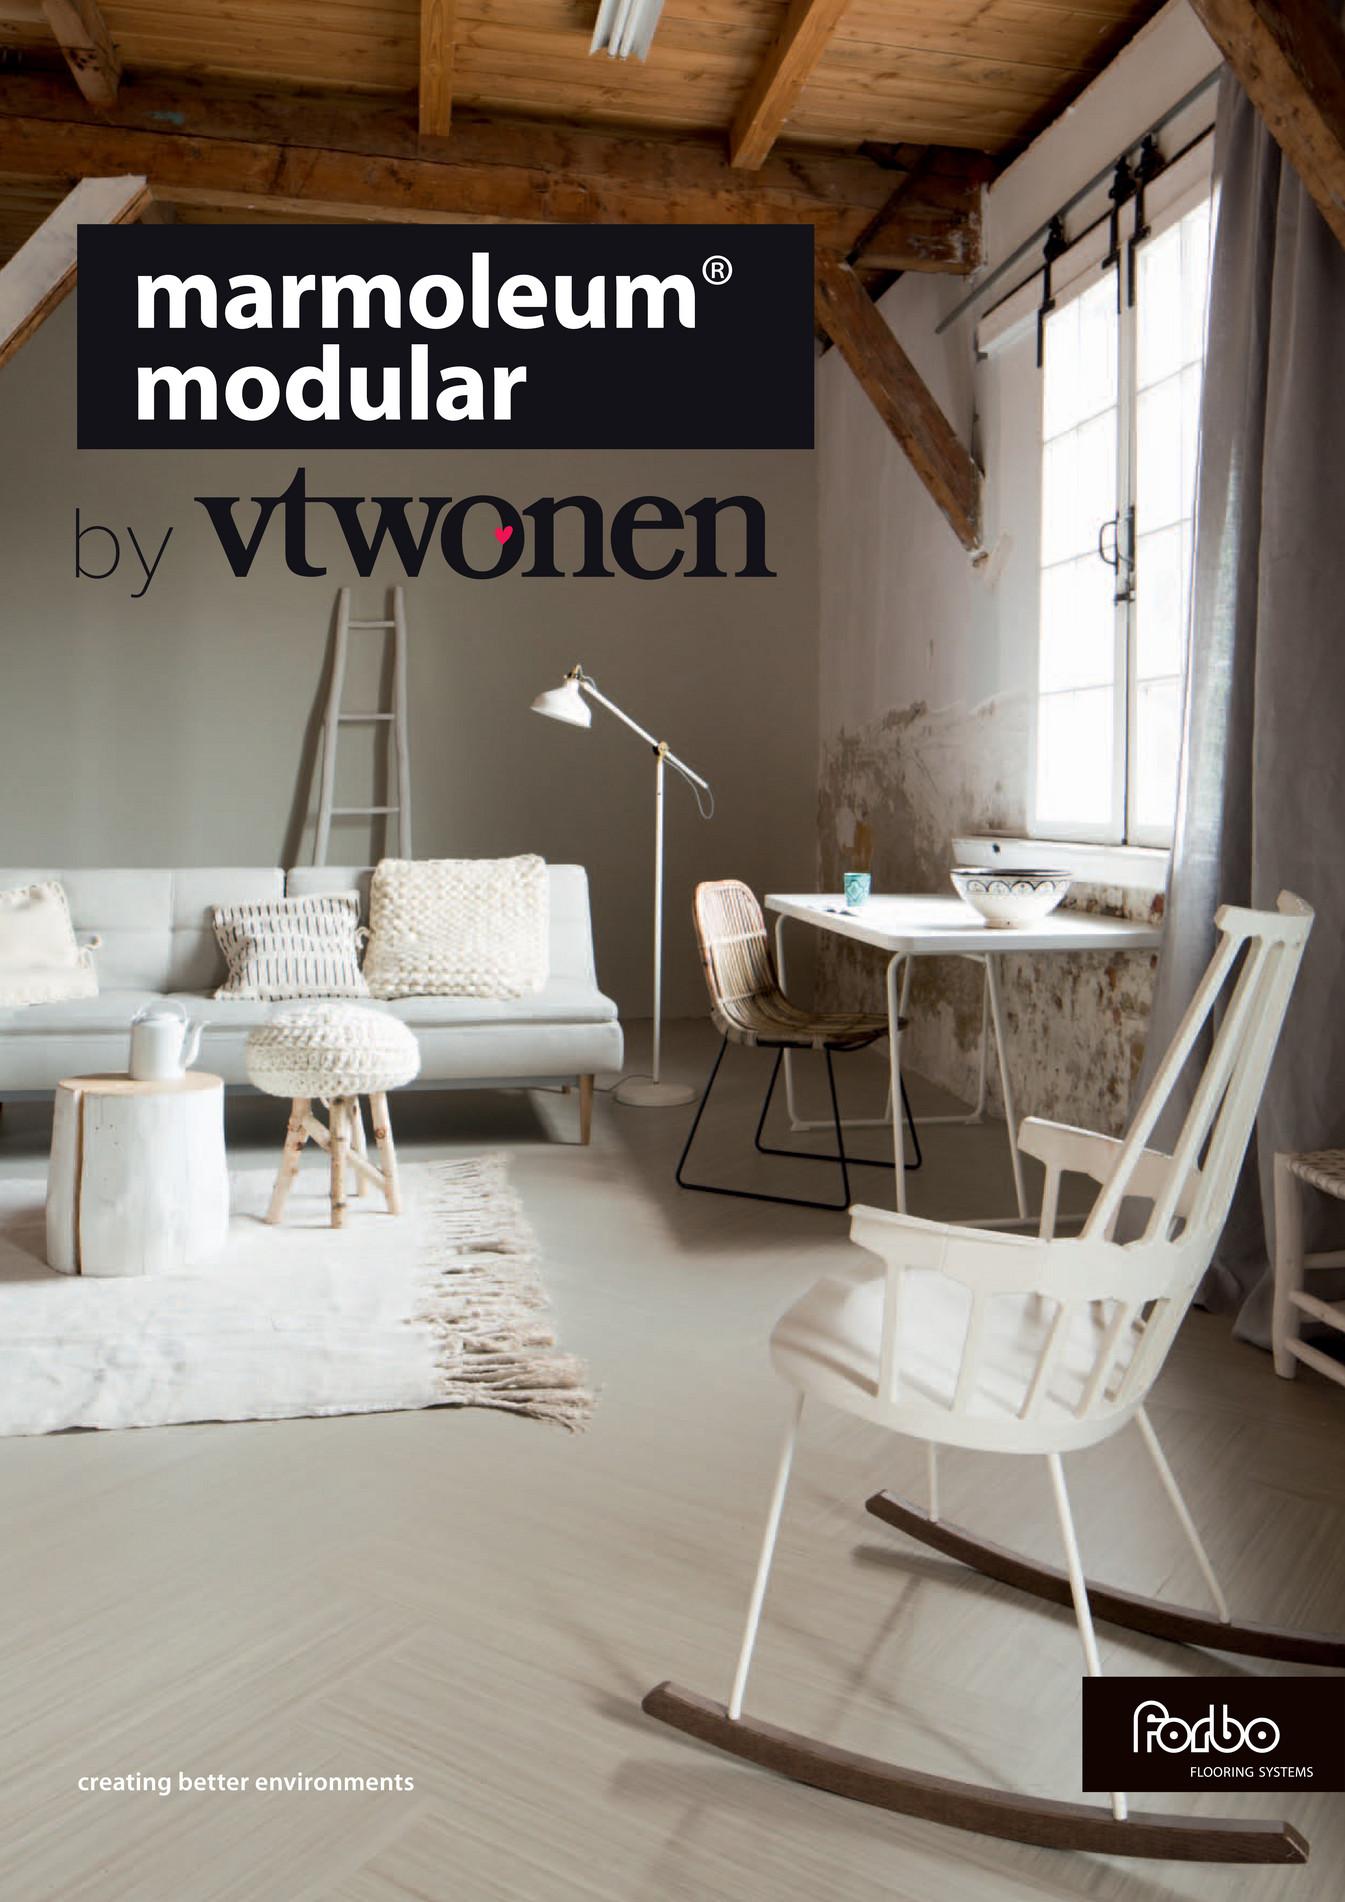 Brochure Marmoleum Modular by vtwonen - Pagina 1